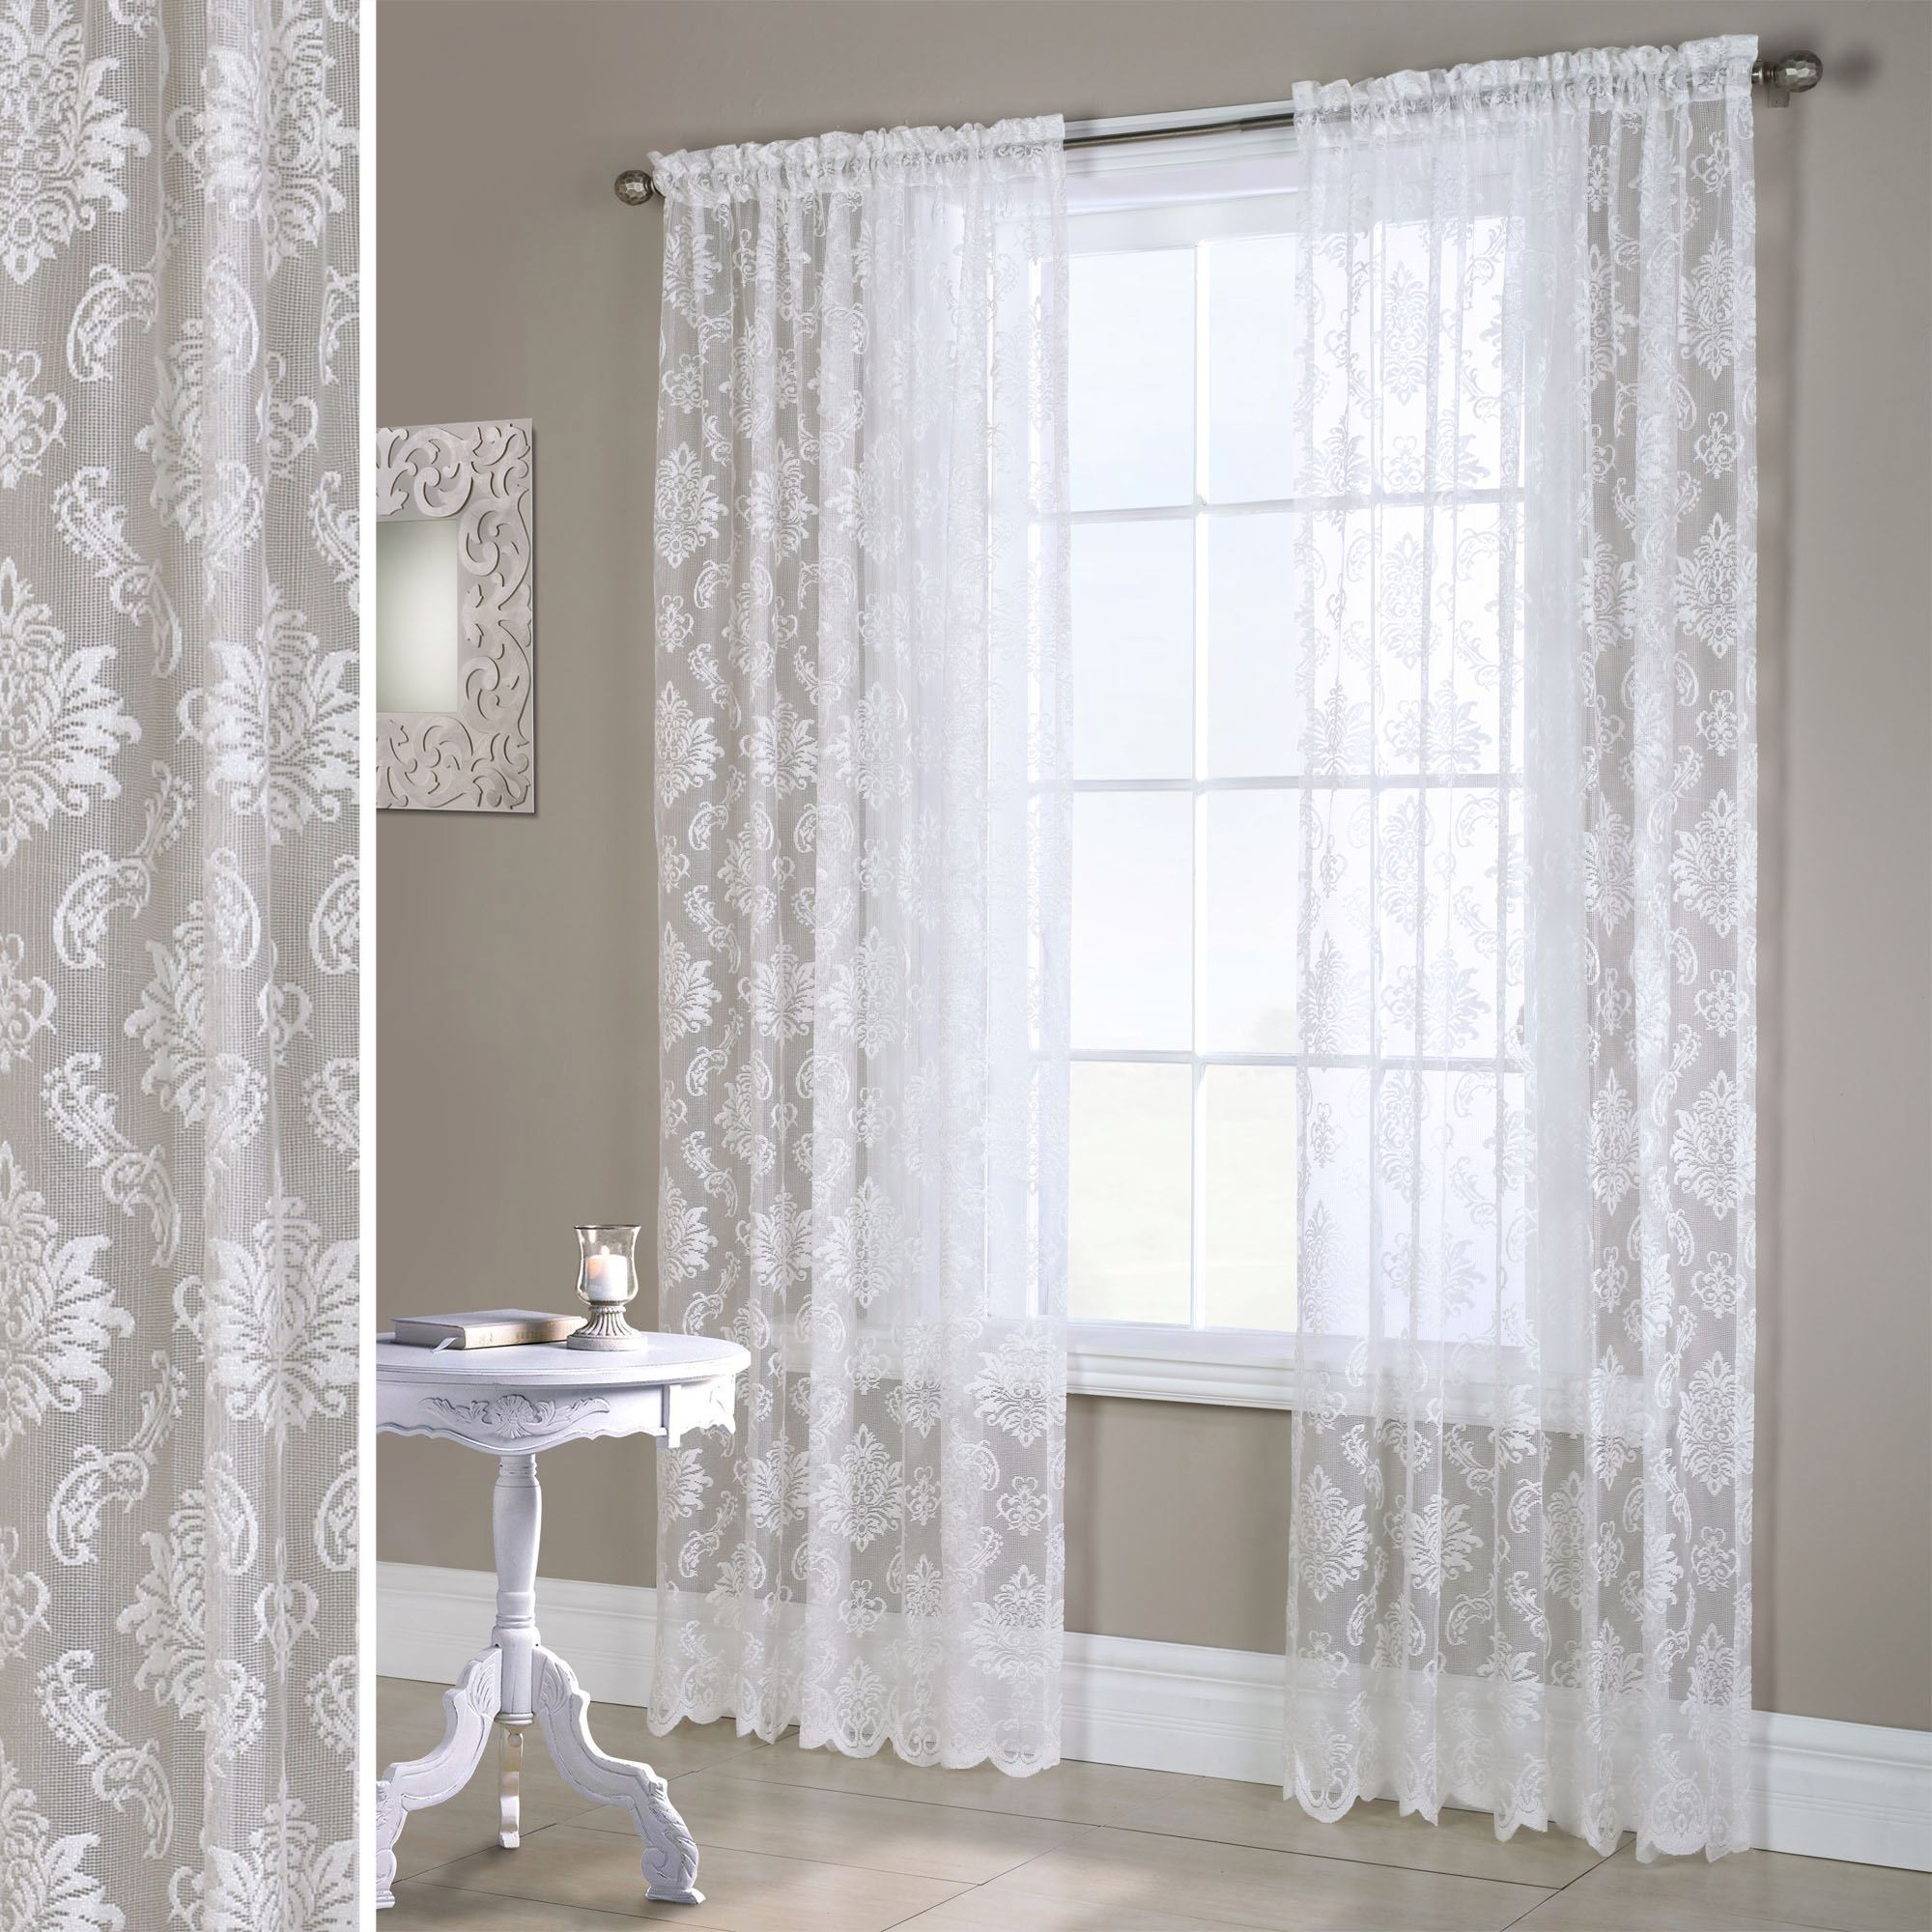 new images queen curtain best york curtains shower tsumi belk interior j of citron design